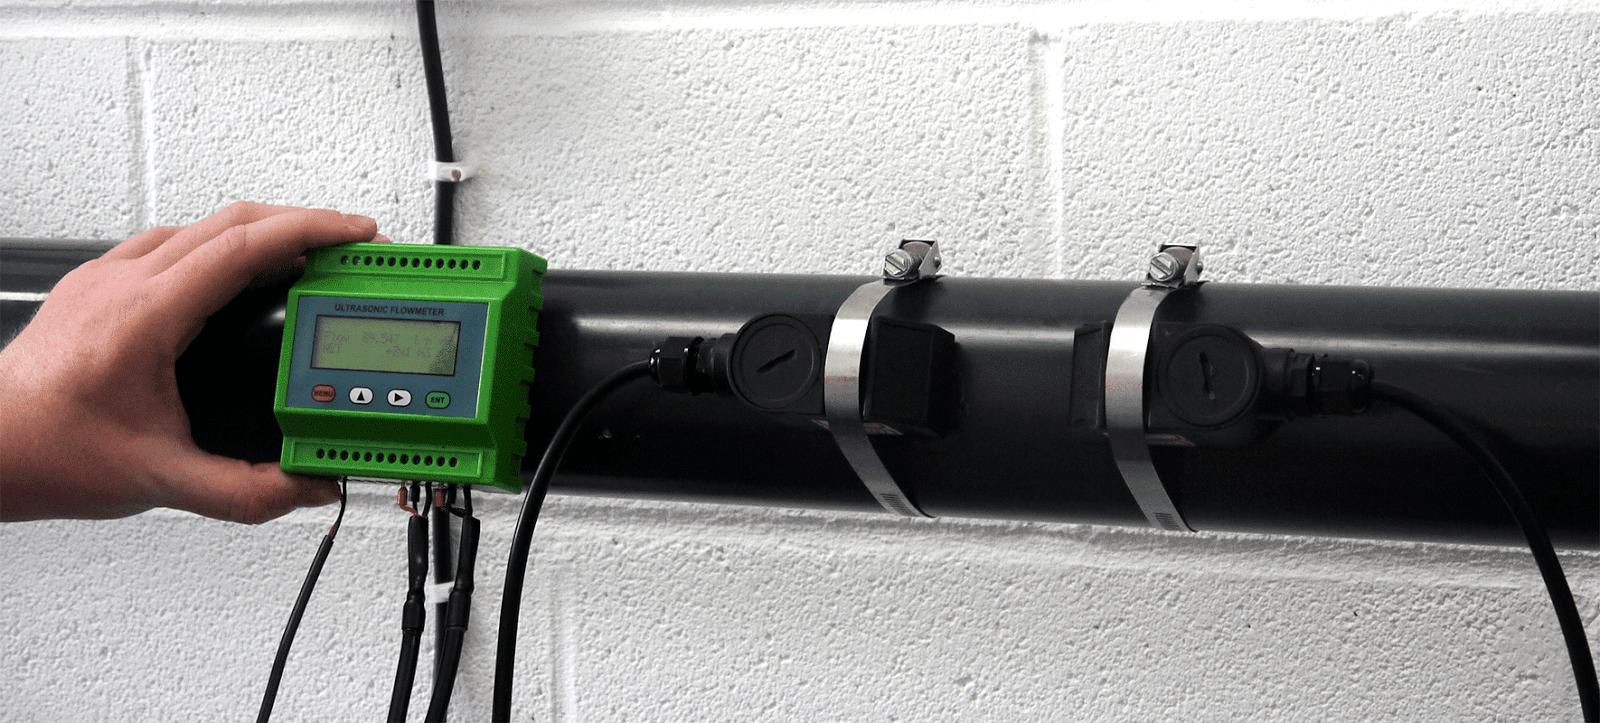 BFU-100-M Ultrasonic Meter